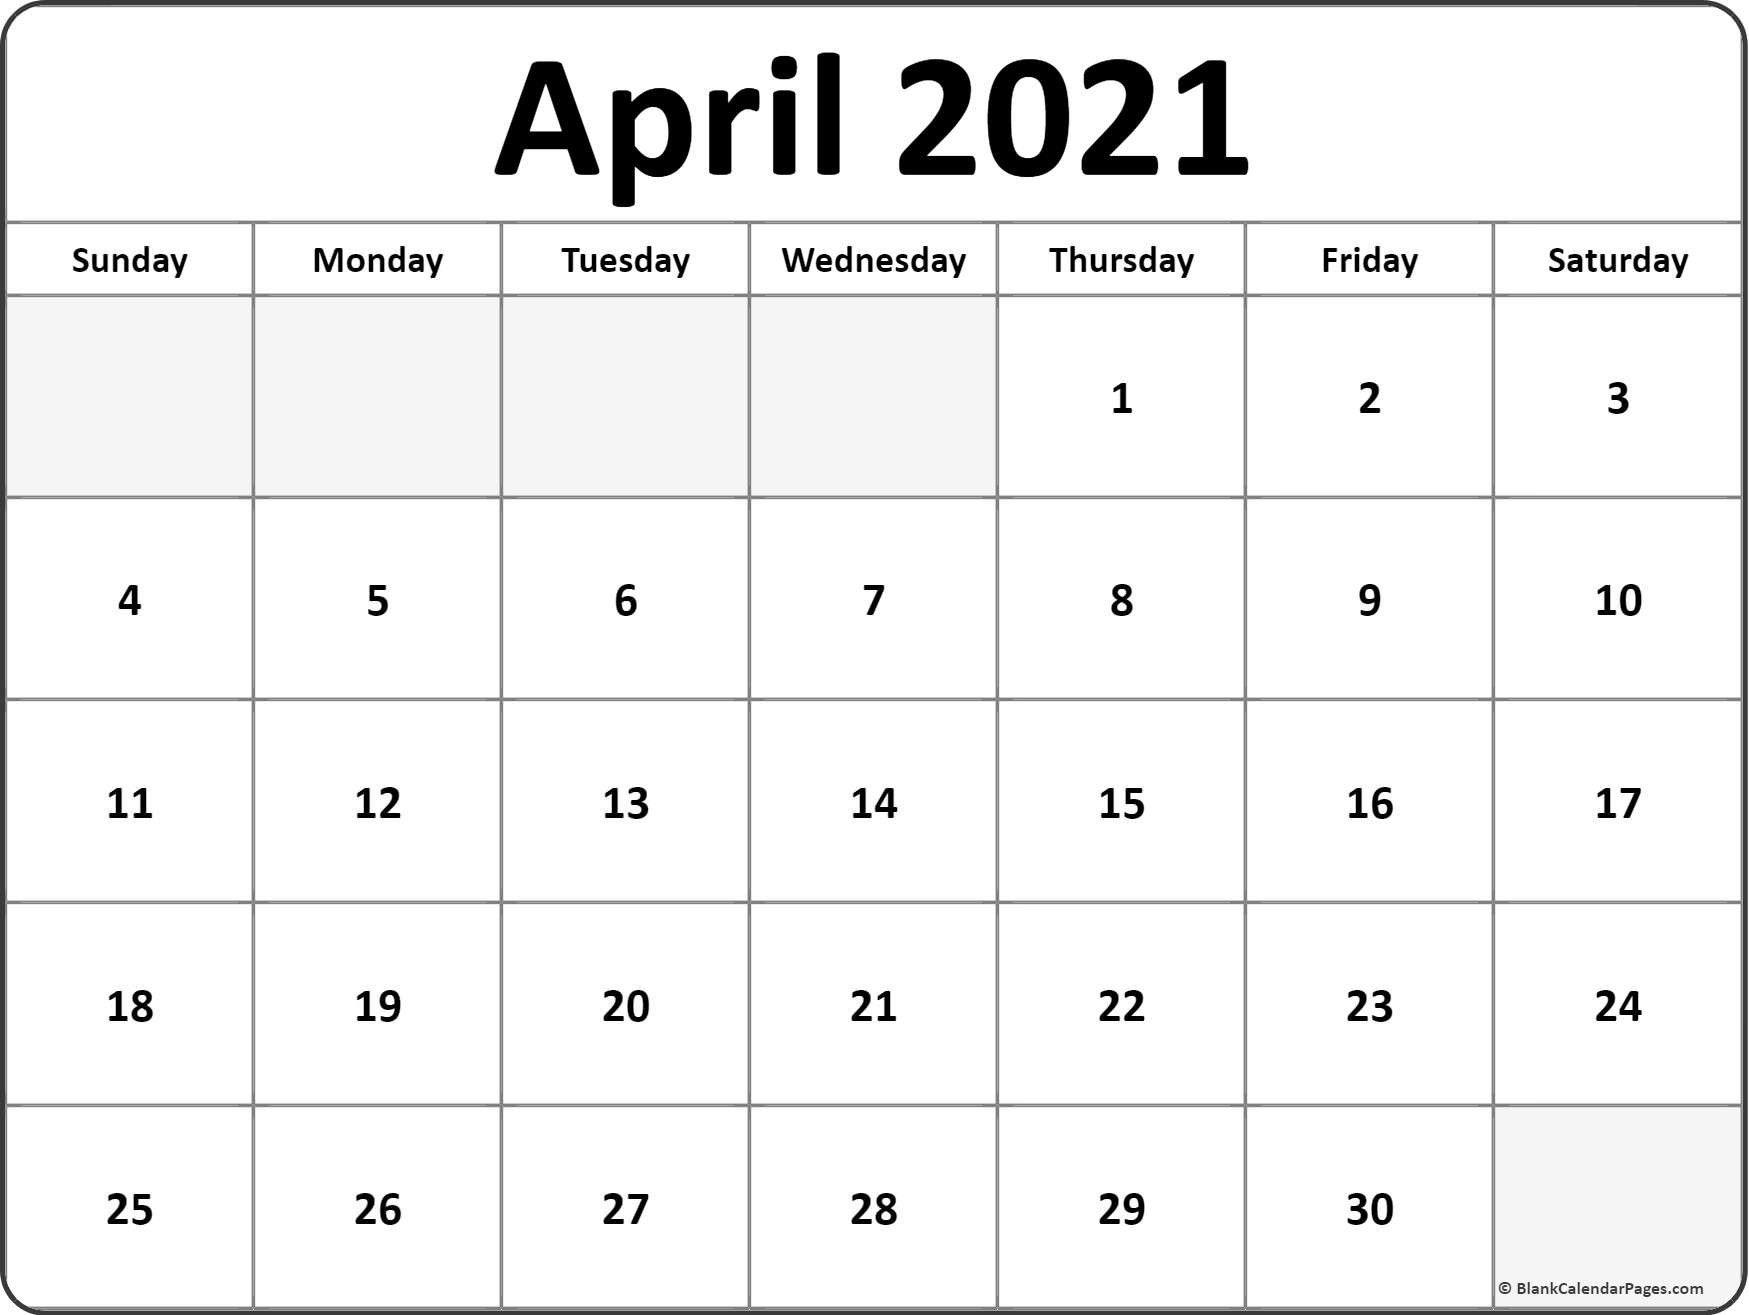 April 2021 Calendar January 2021 Calendar July 2021 Blank